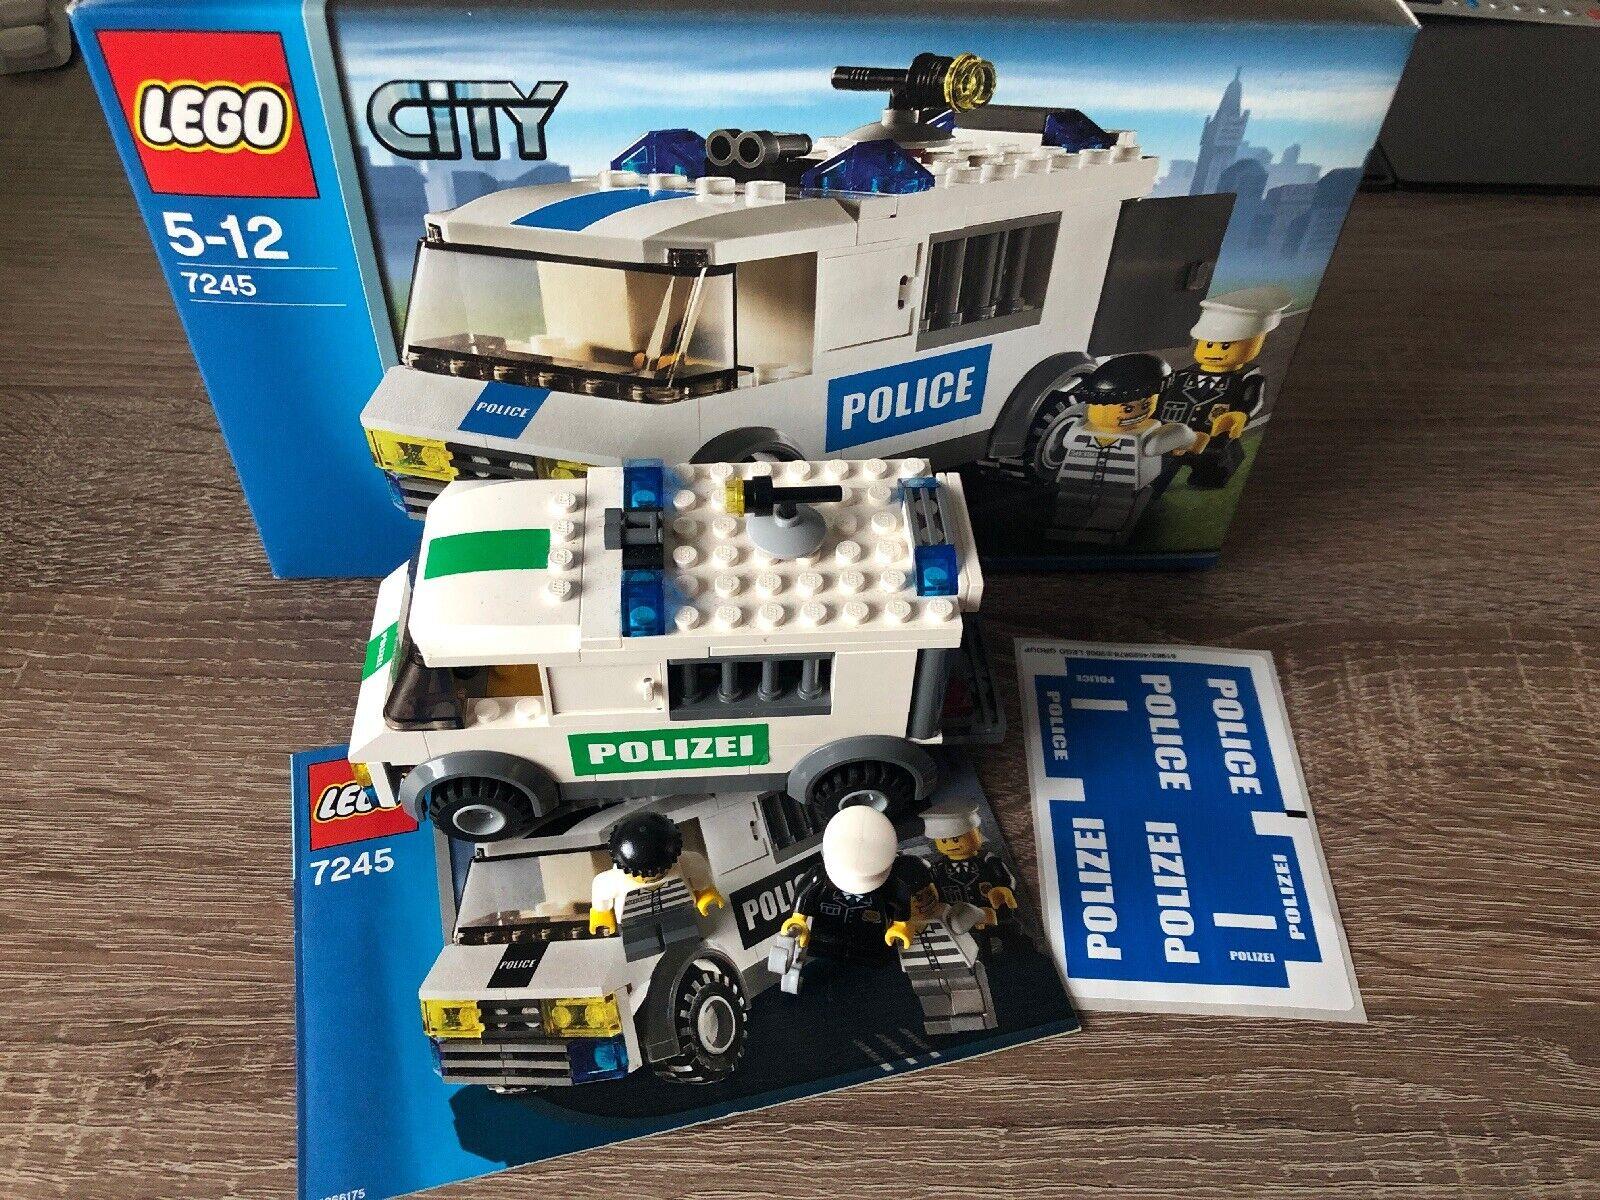 LEGO City, LEGO Polizei, LEGO Gefangenen Transporter (LEGO 7245)